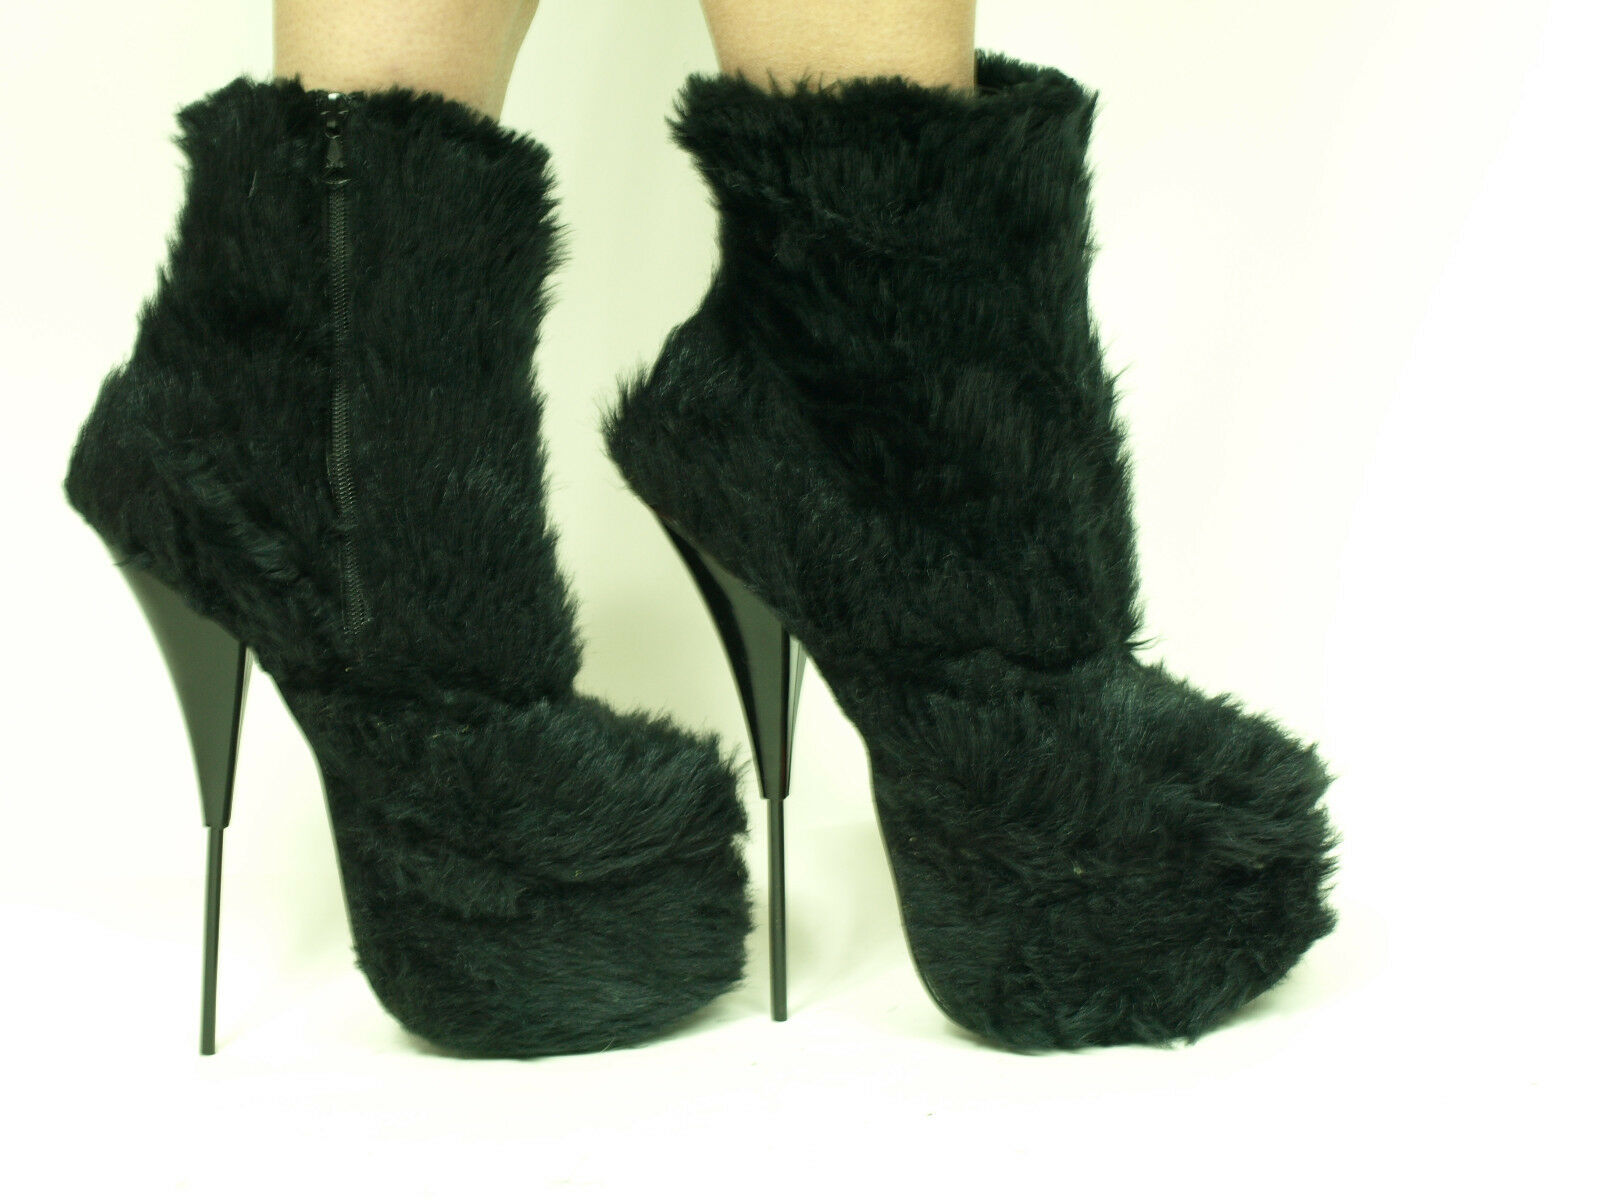 PROMOTIONS Caballo HAIR Tacones Tacones Tacones Altos botas Talla 5-16 - 8  - 20cm producen Polonia  diseño único